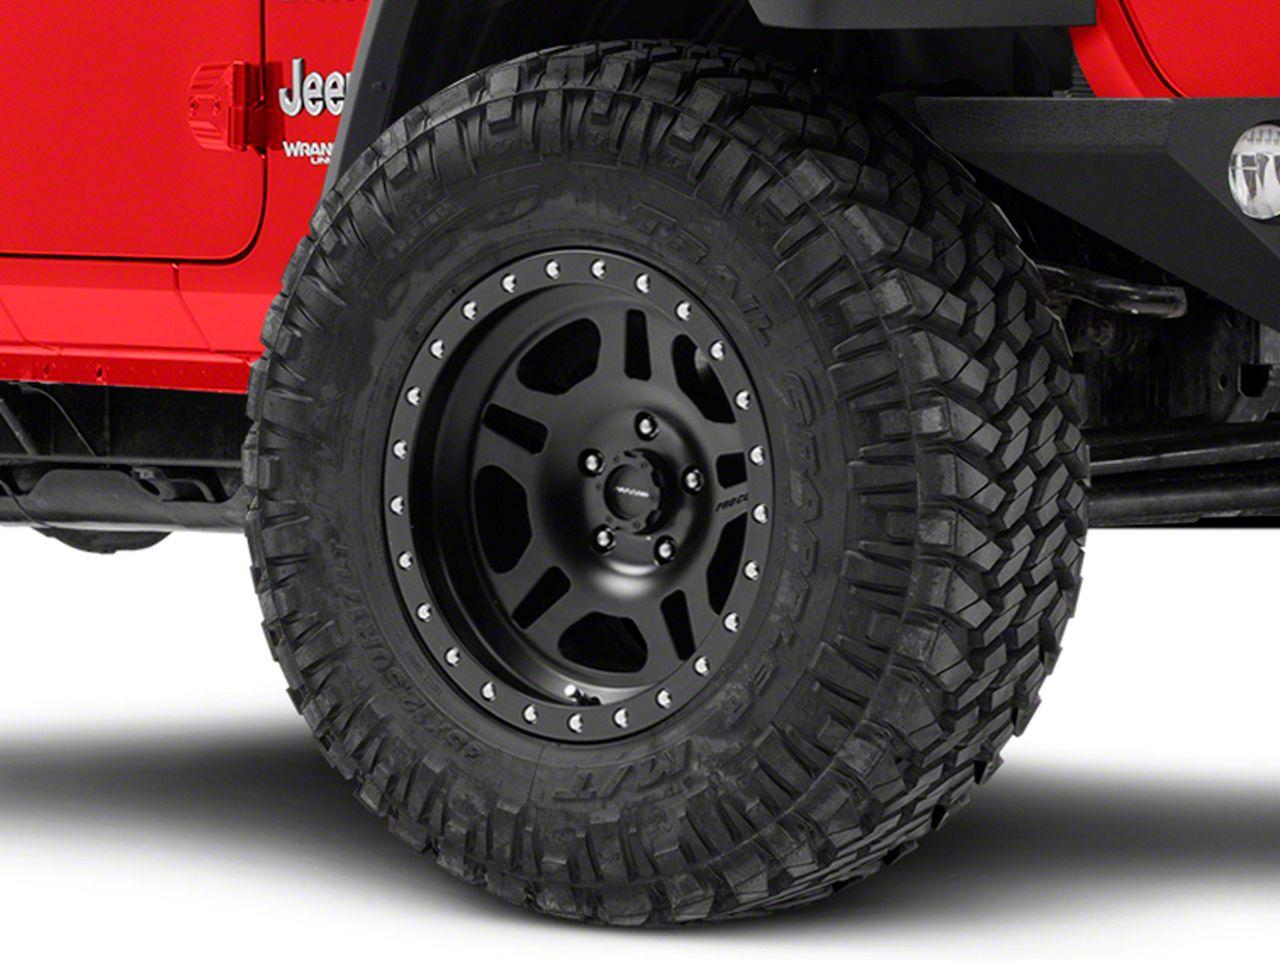 Pro Comp Wheels La Paz Series 5029 Black Wheel - 17x8.5 (18-19 Jeep Wrangler JL)